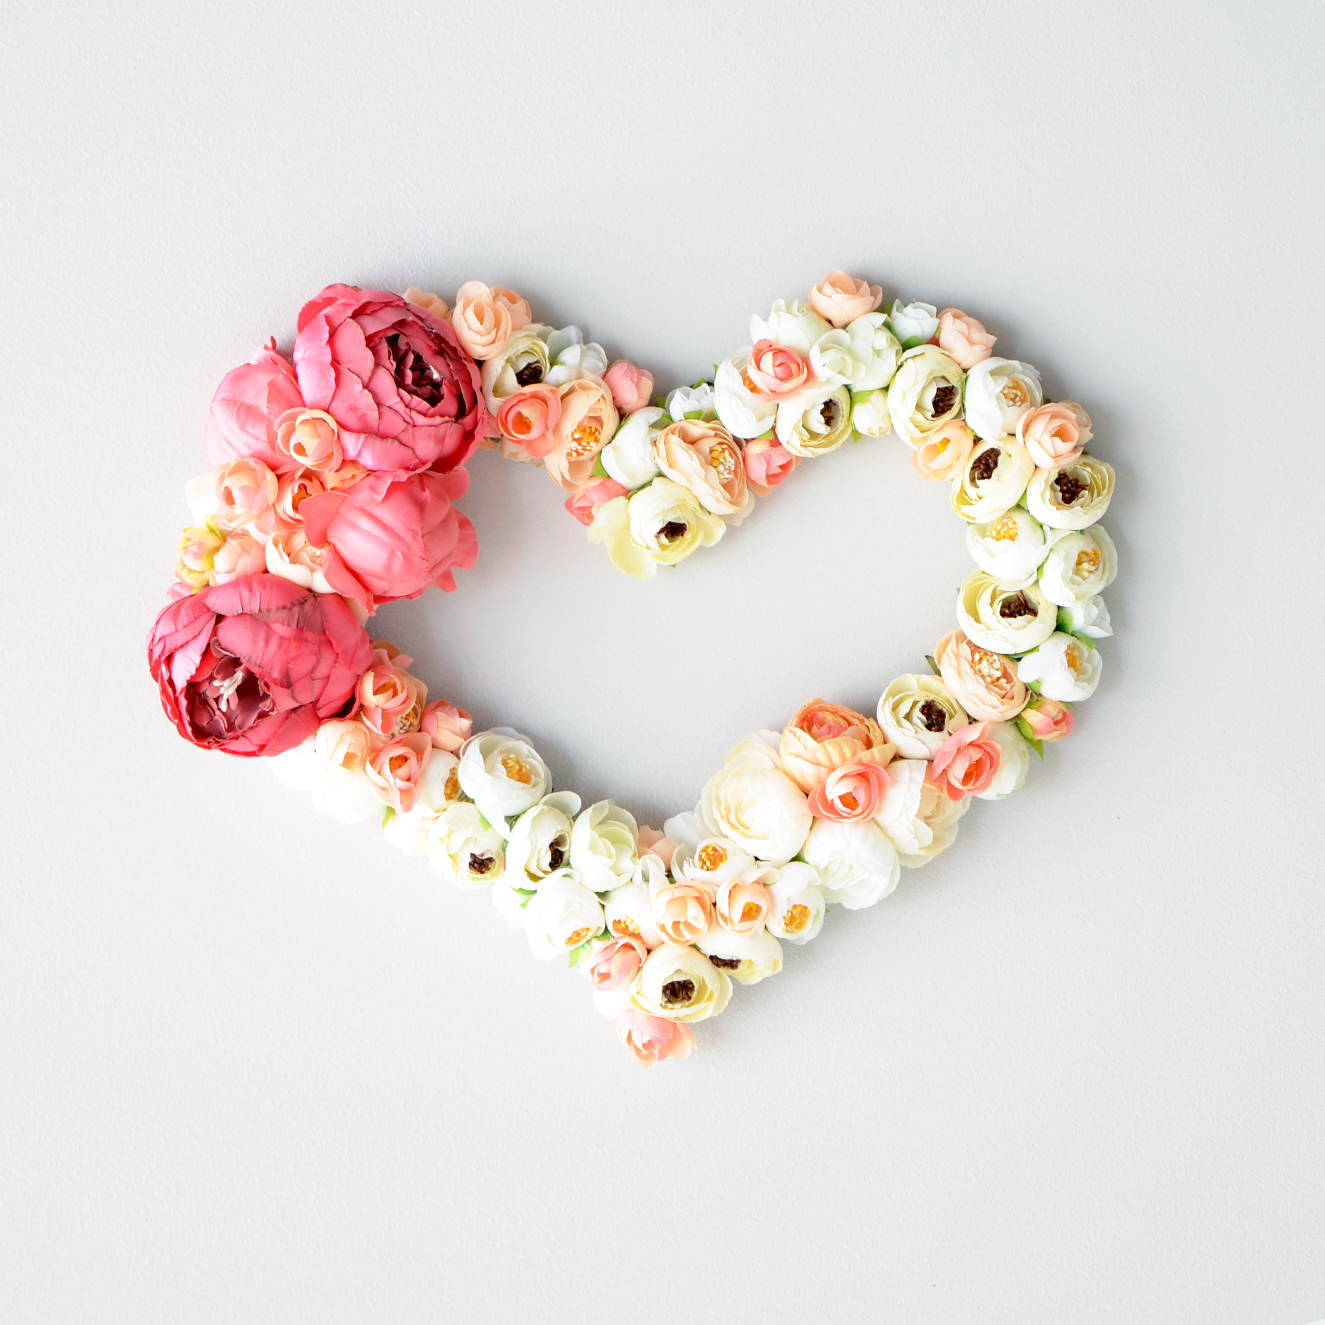 Valentines heartbeat decor